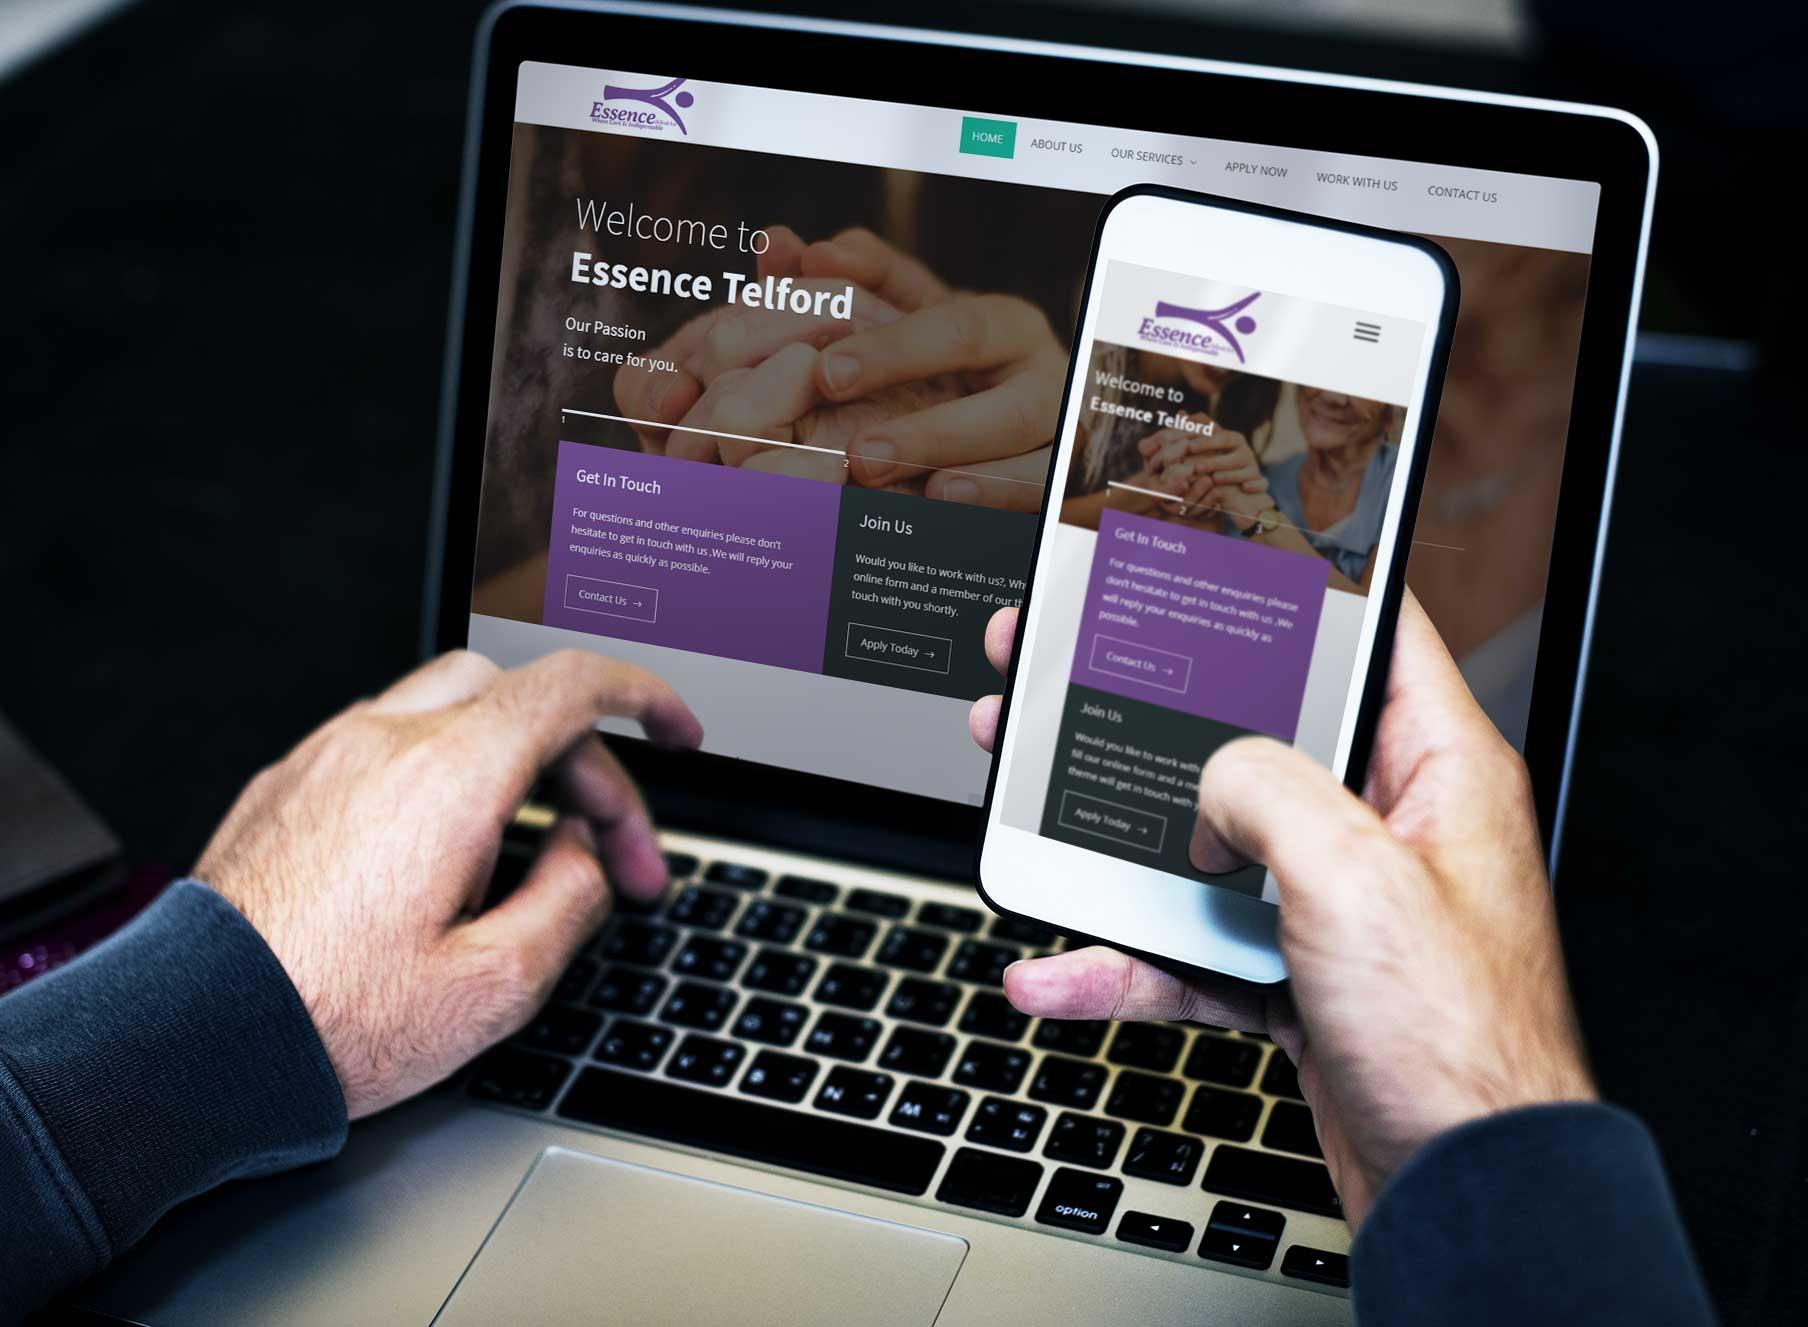 Essence Kare Branding, Social Media Marketing & Web Design